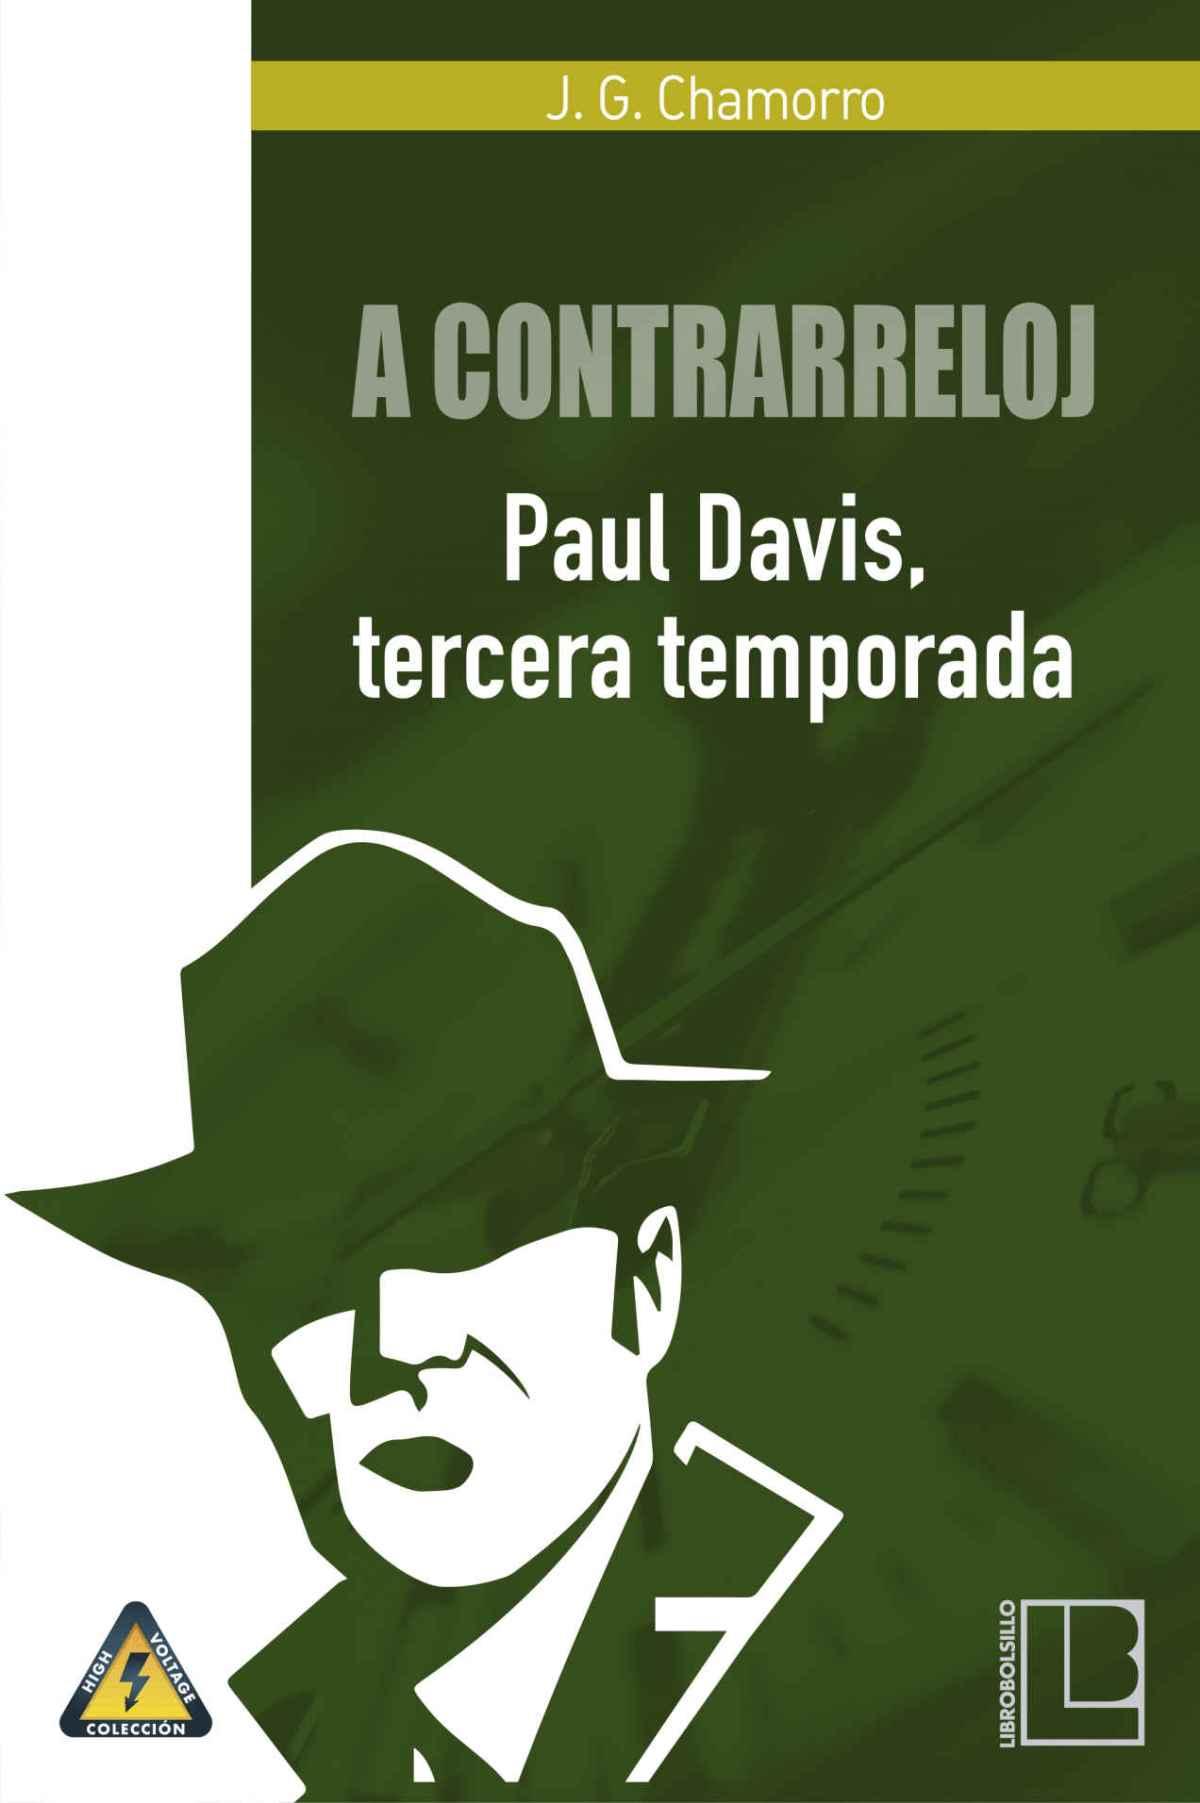 Paul Davis visita